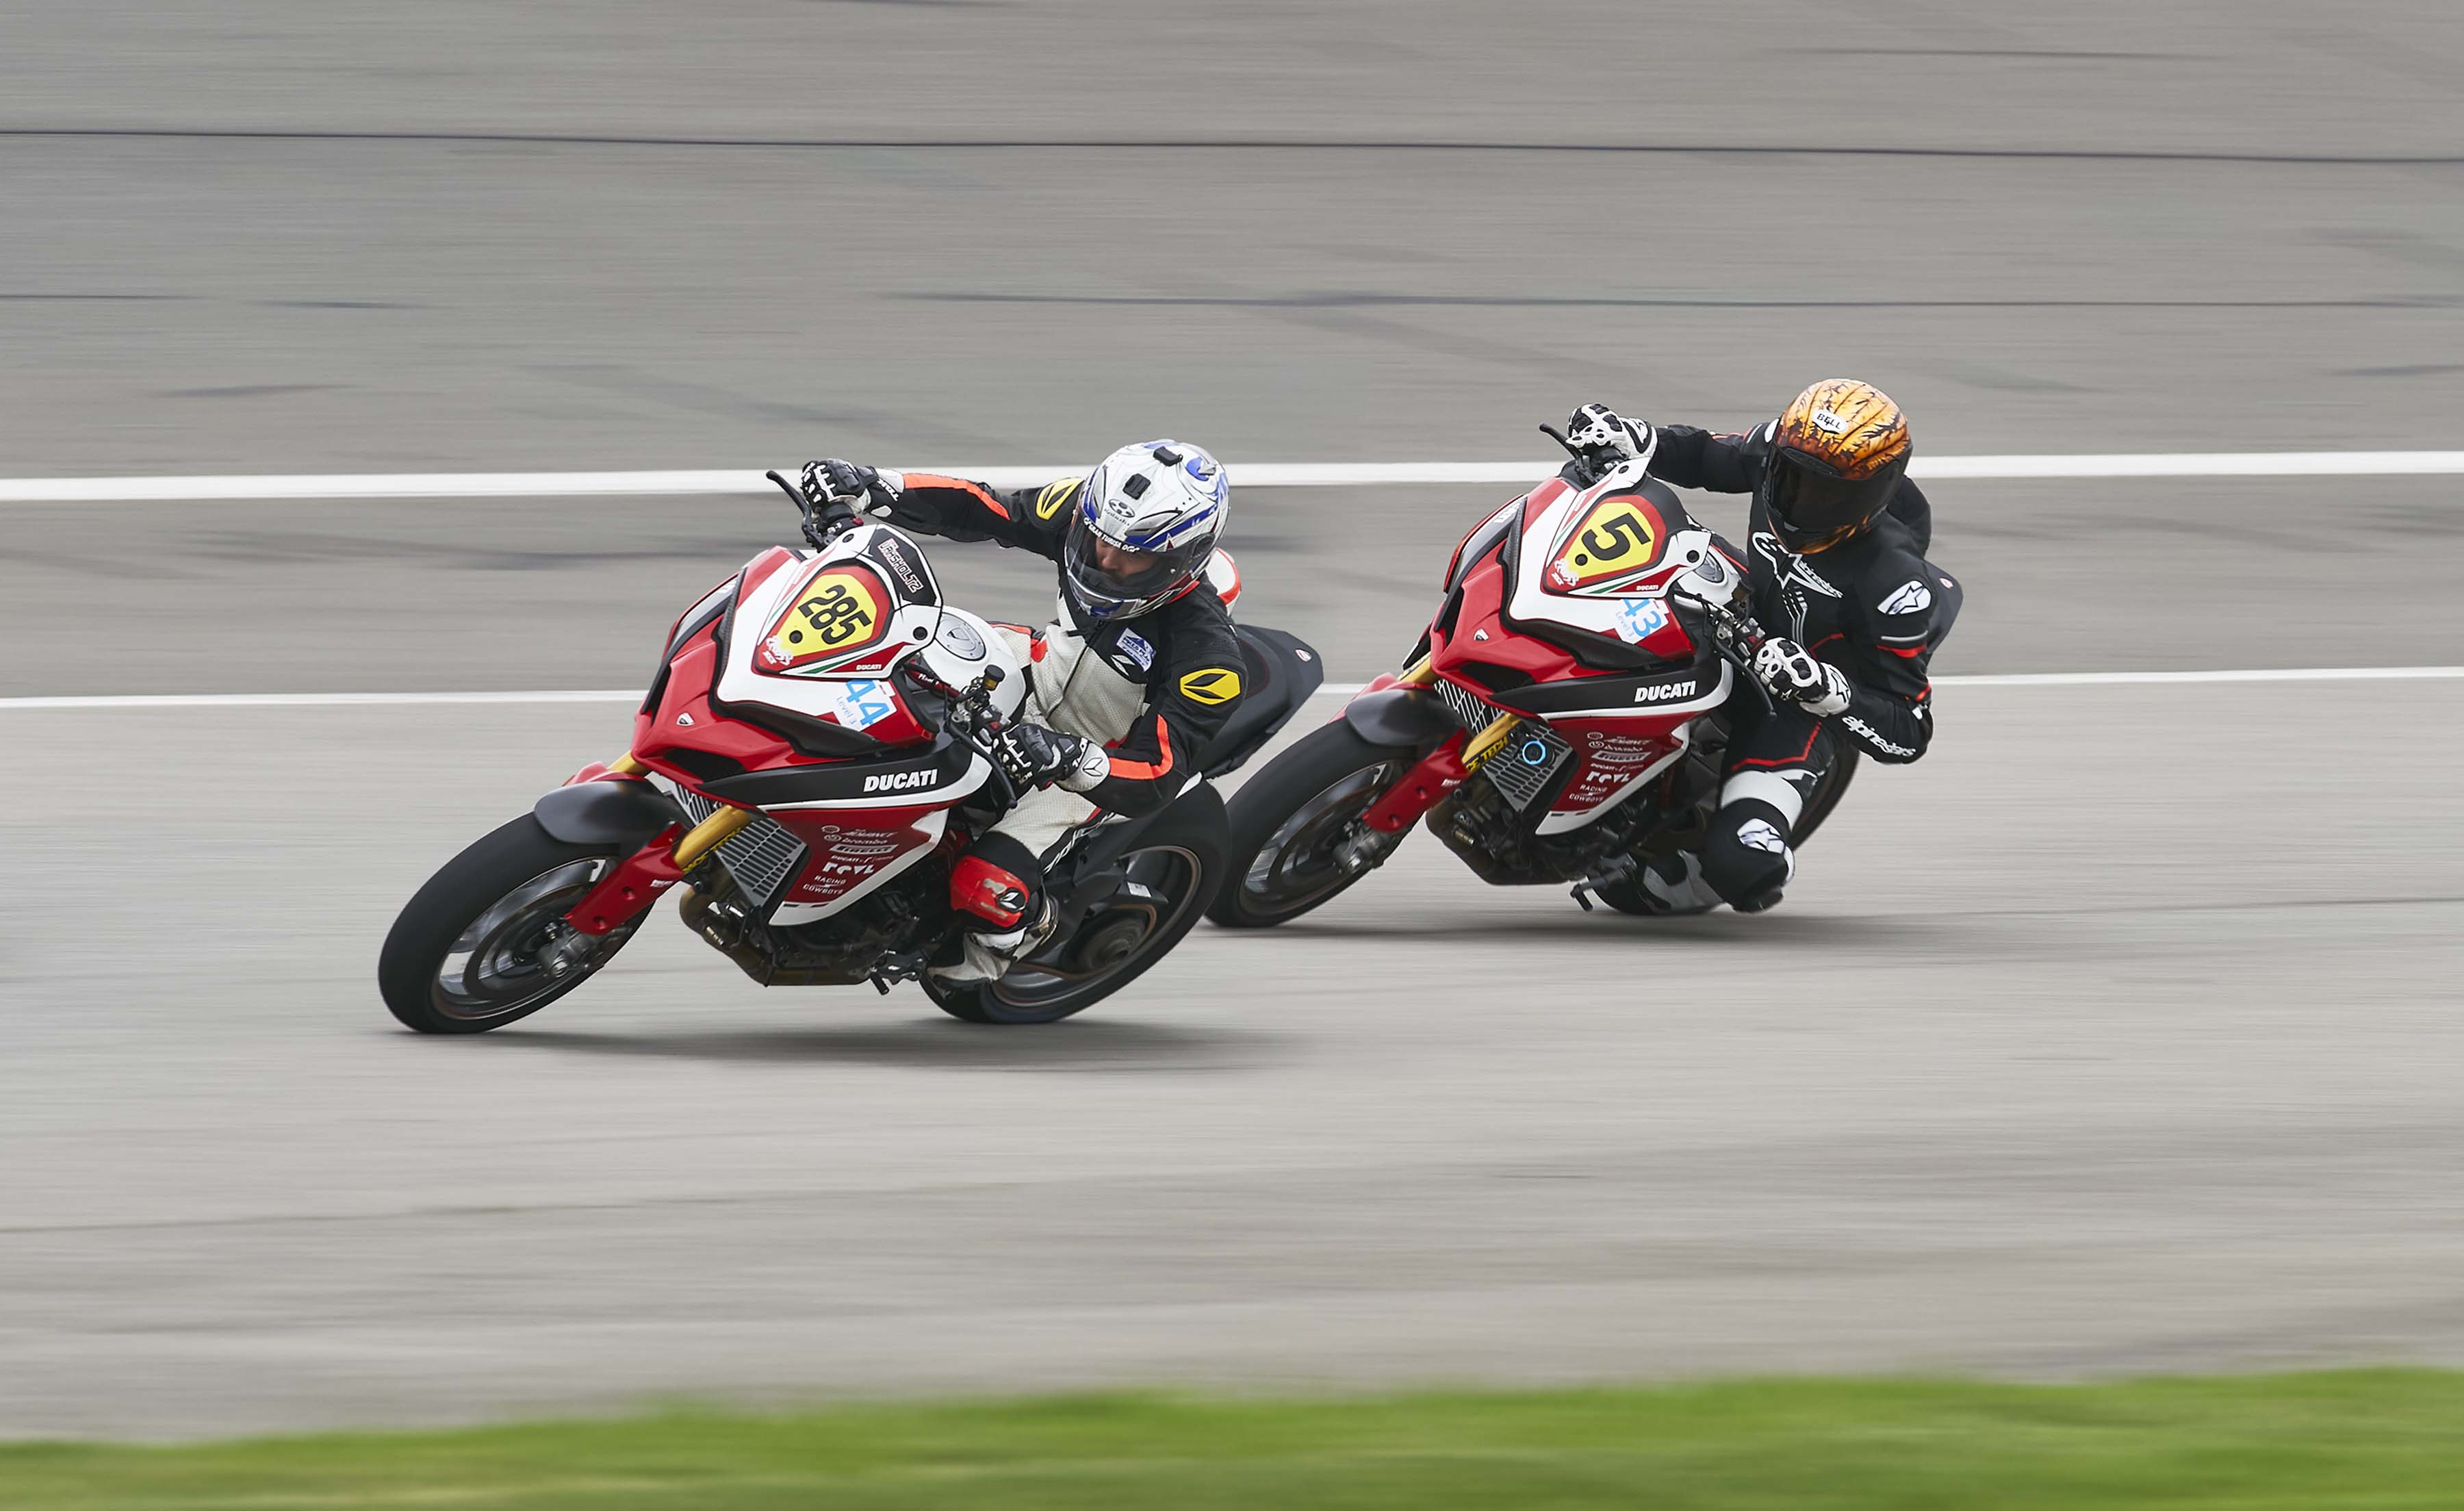 More Photos Of The Fastest Ducati Multistrada 1260